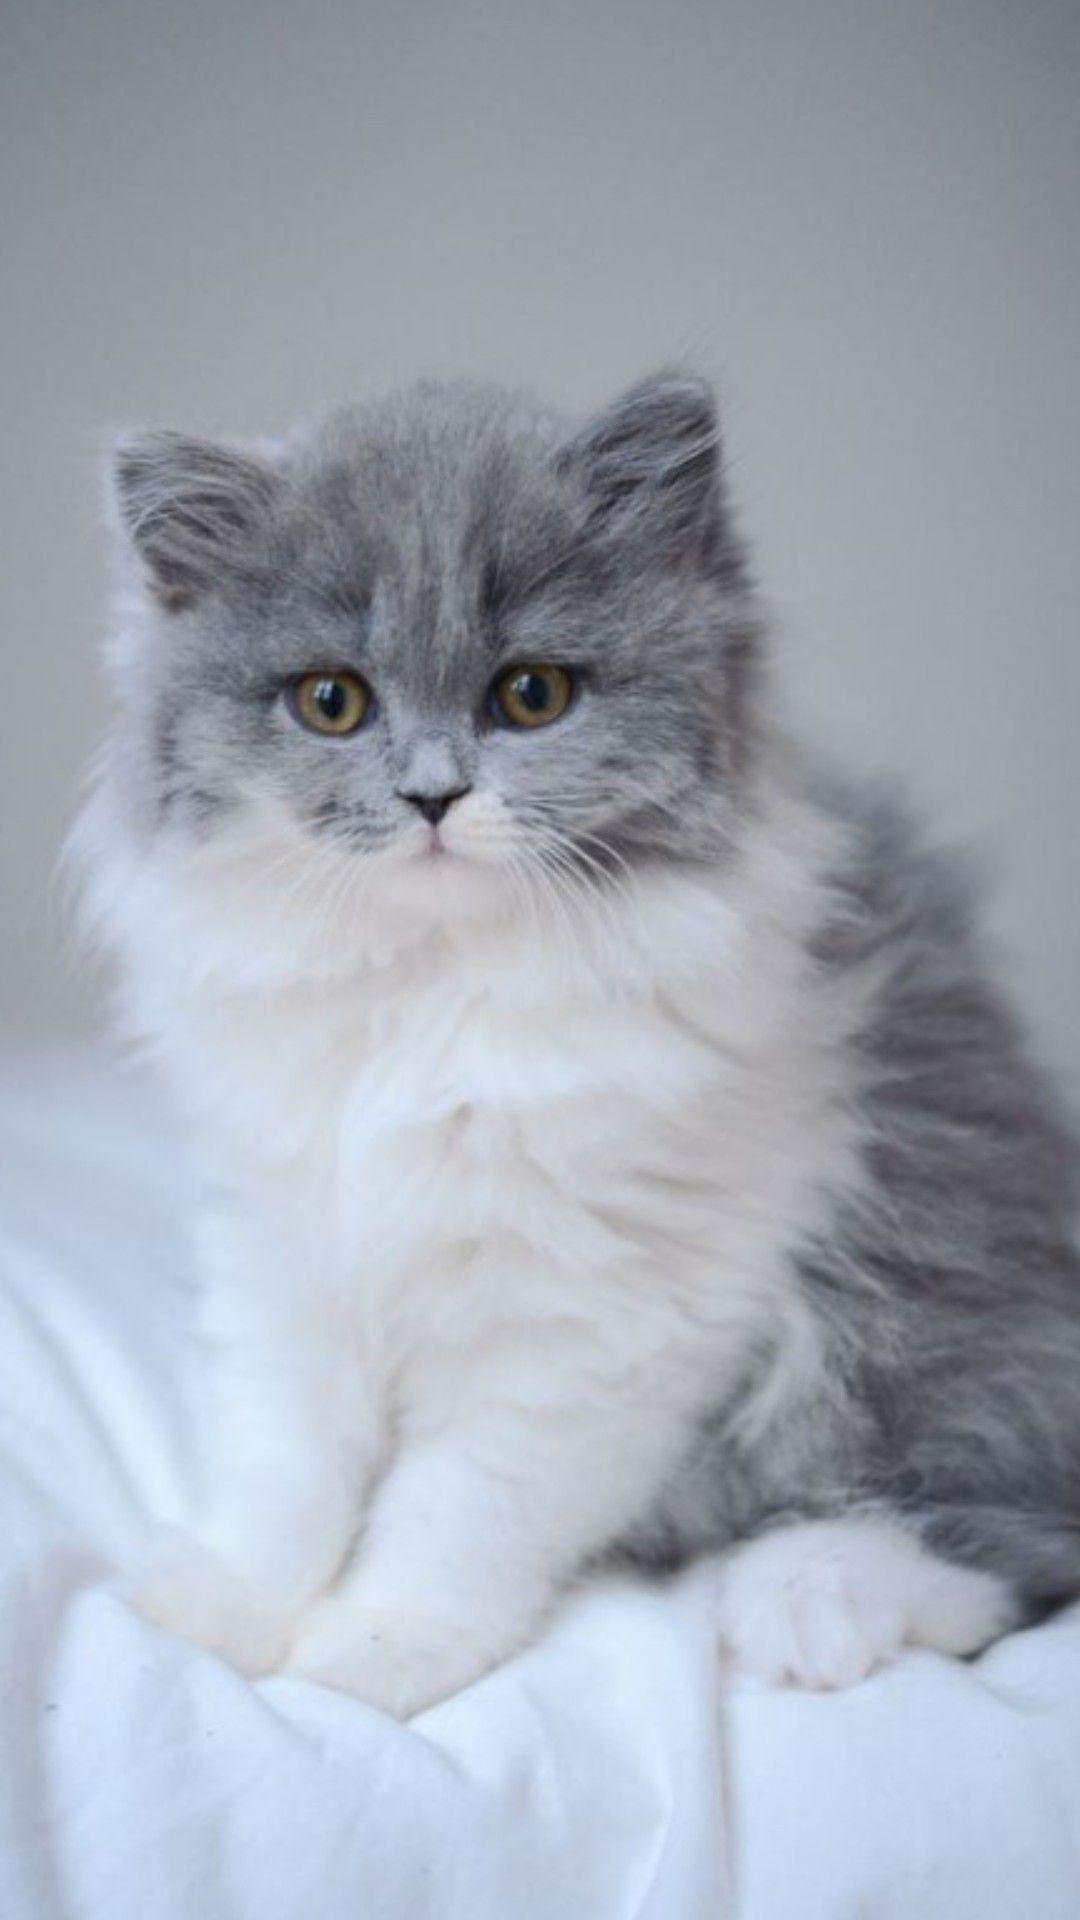 Pin By Deedee Shenold On Pisici Grey And White Kitten Kittens Cutest Fluffy Kittens